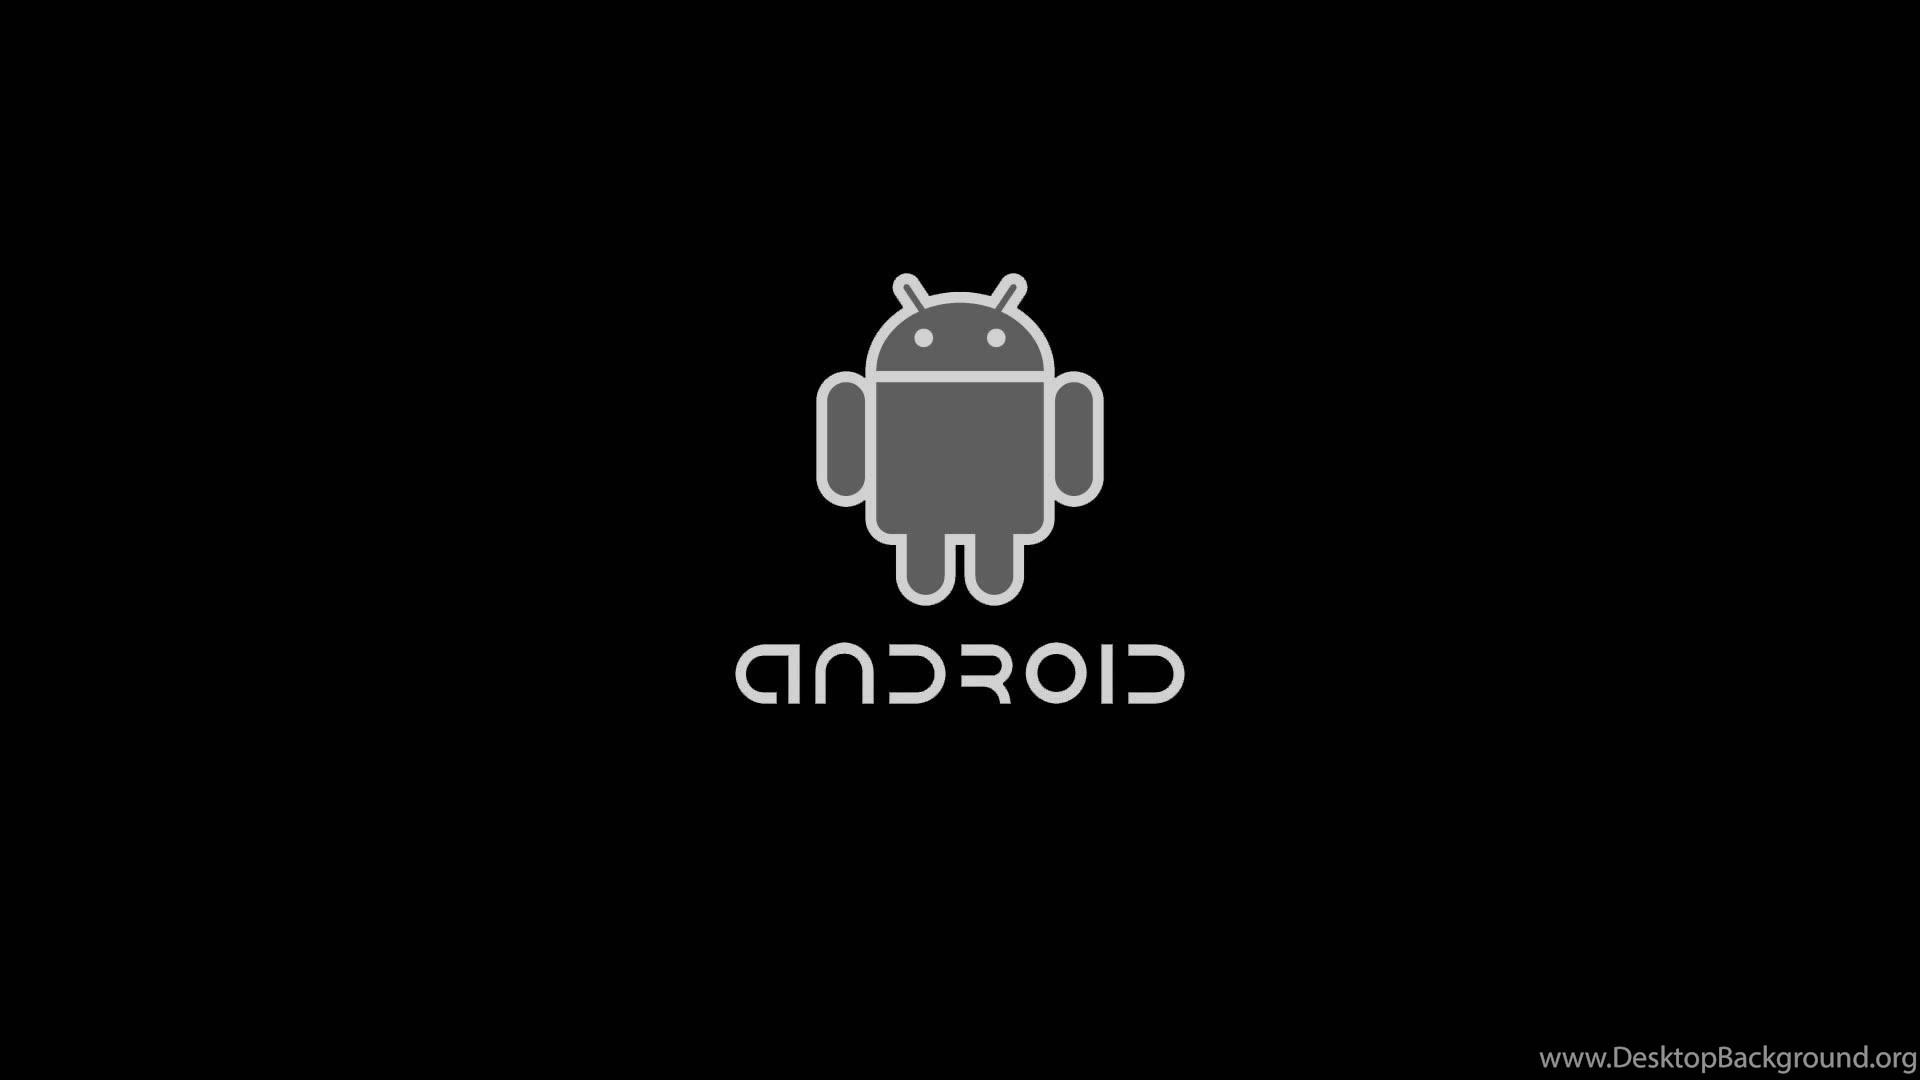 Wallpapers For Plain Black Android Desktop Background